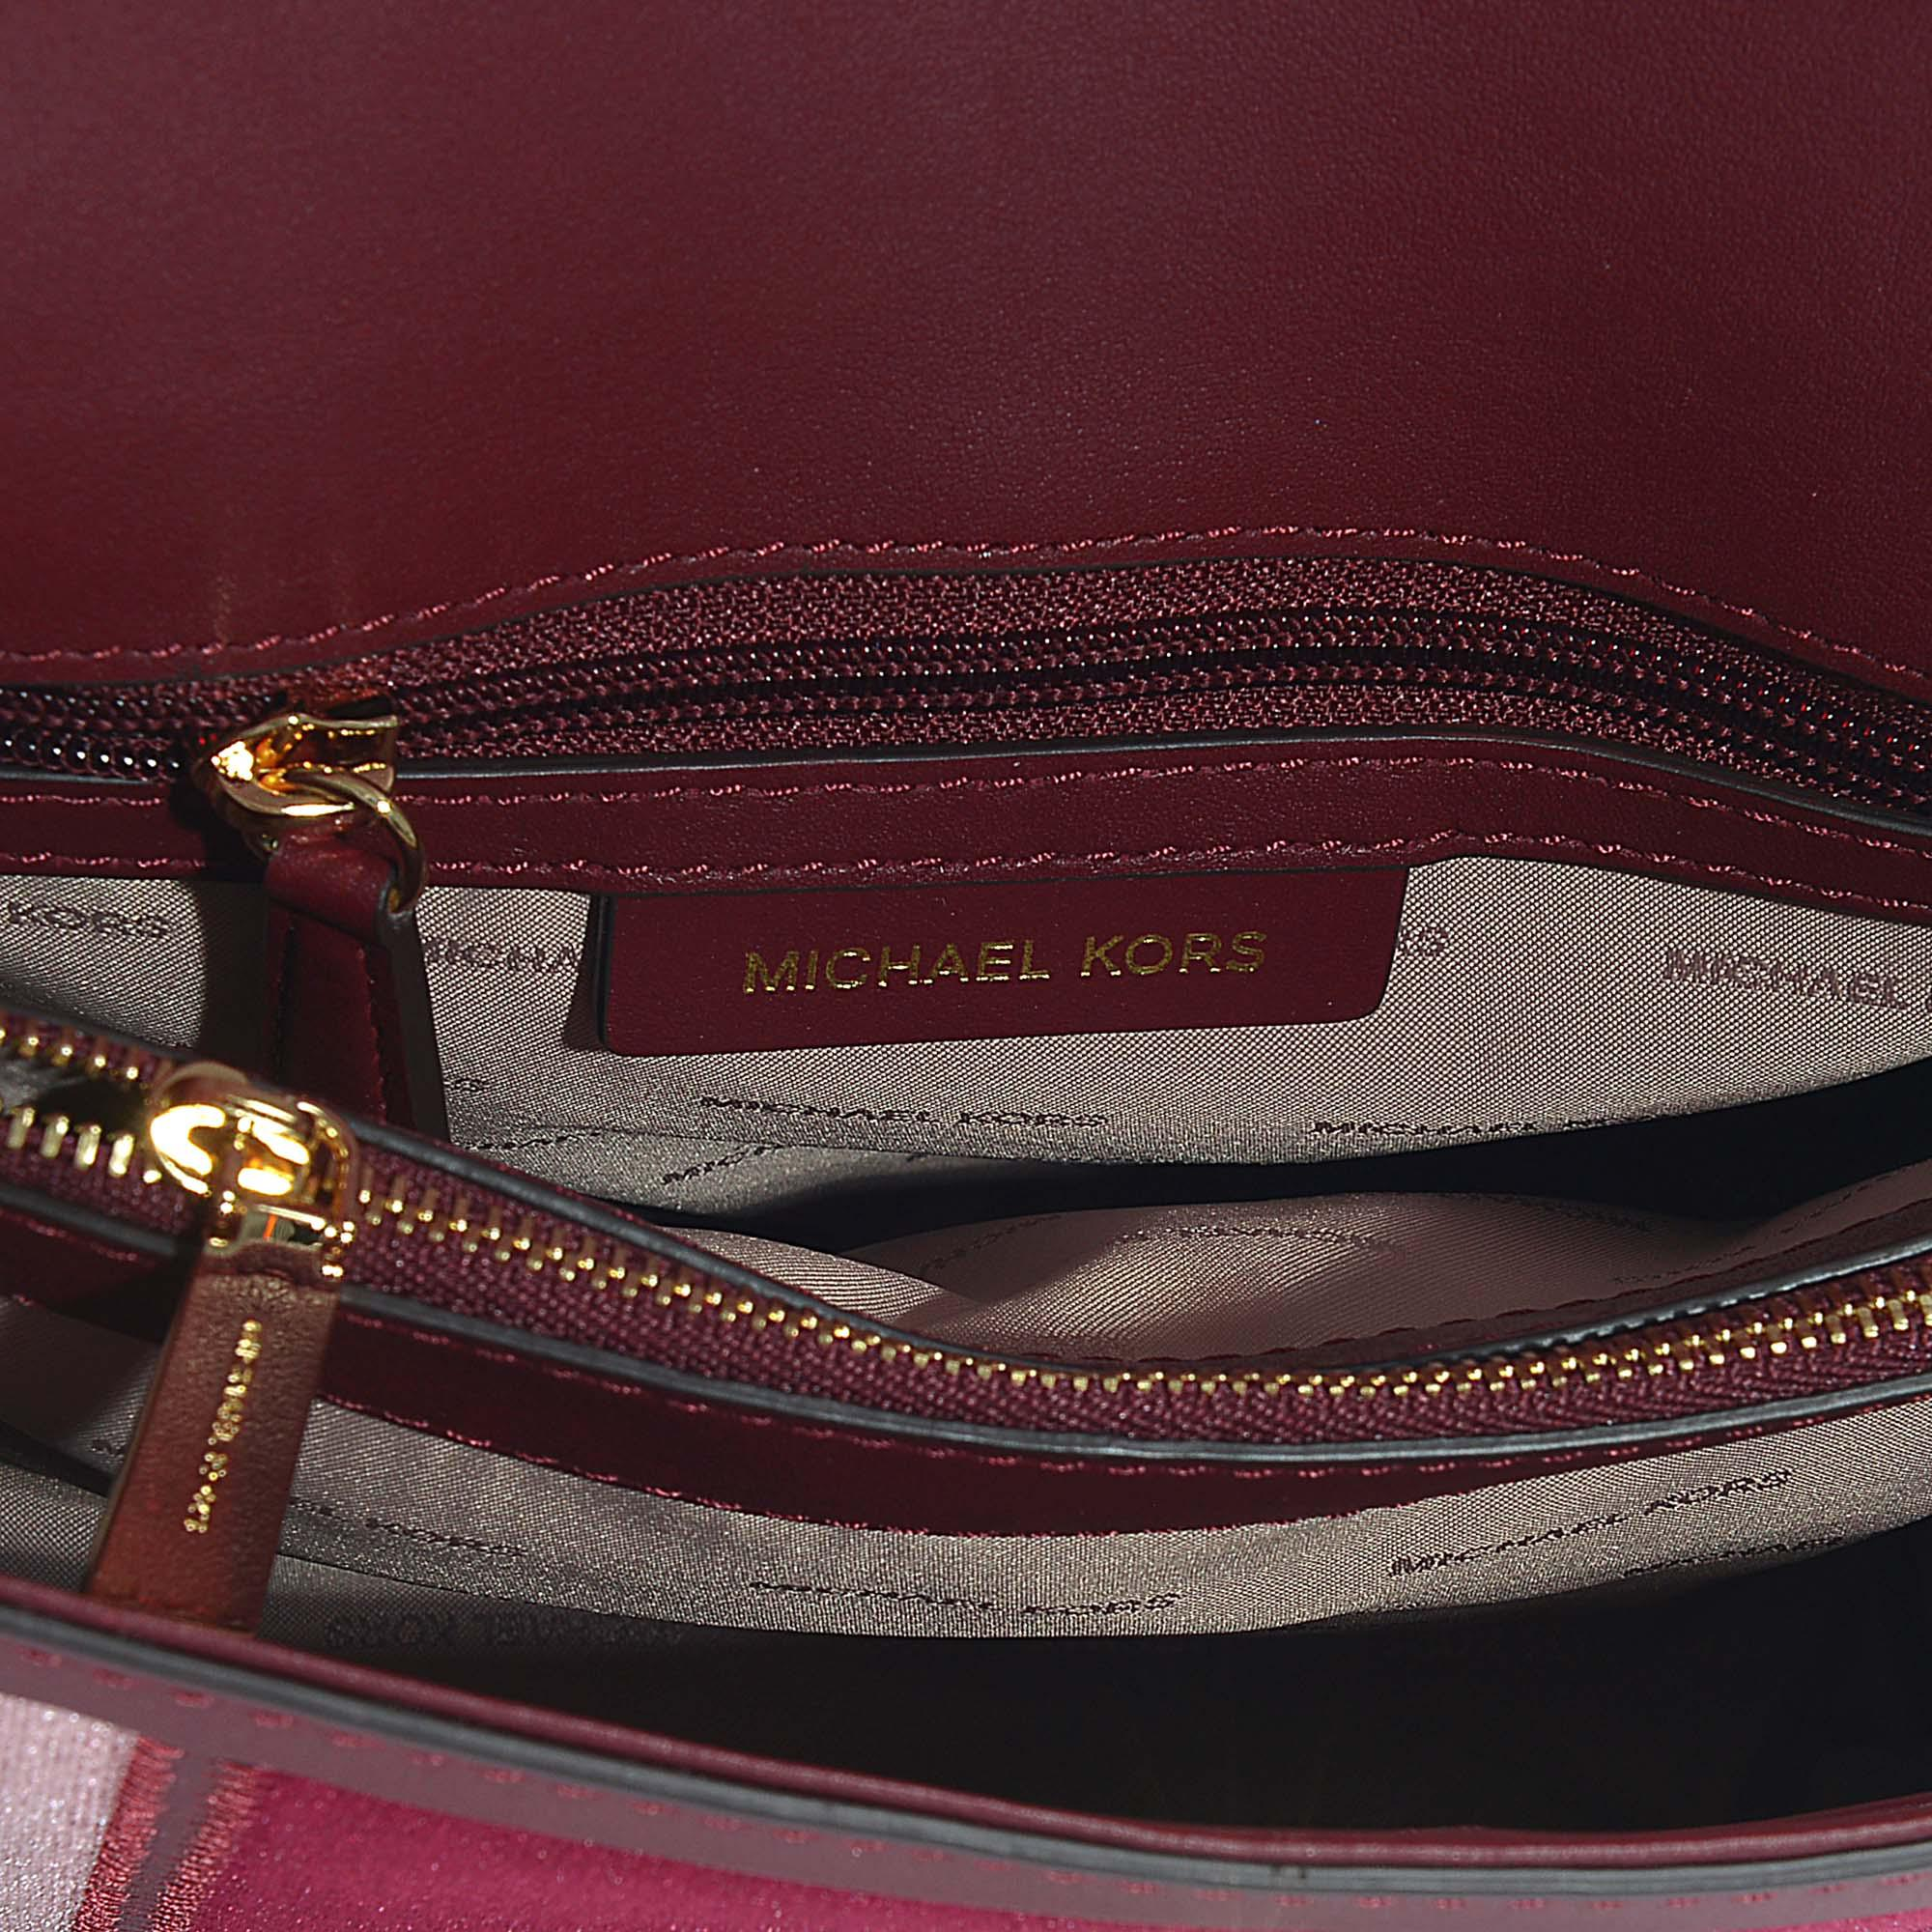 ab5a7d7ec7ca Michael Kors Maroon Velvet Backpack – Patmo Technologies Limited